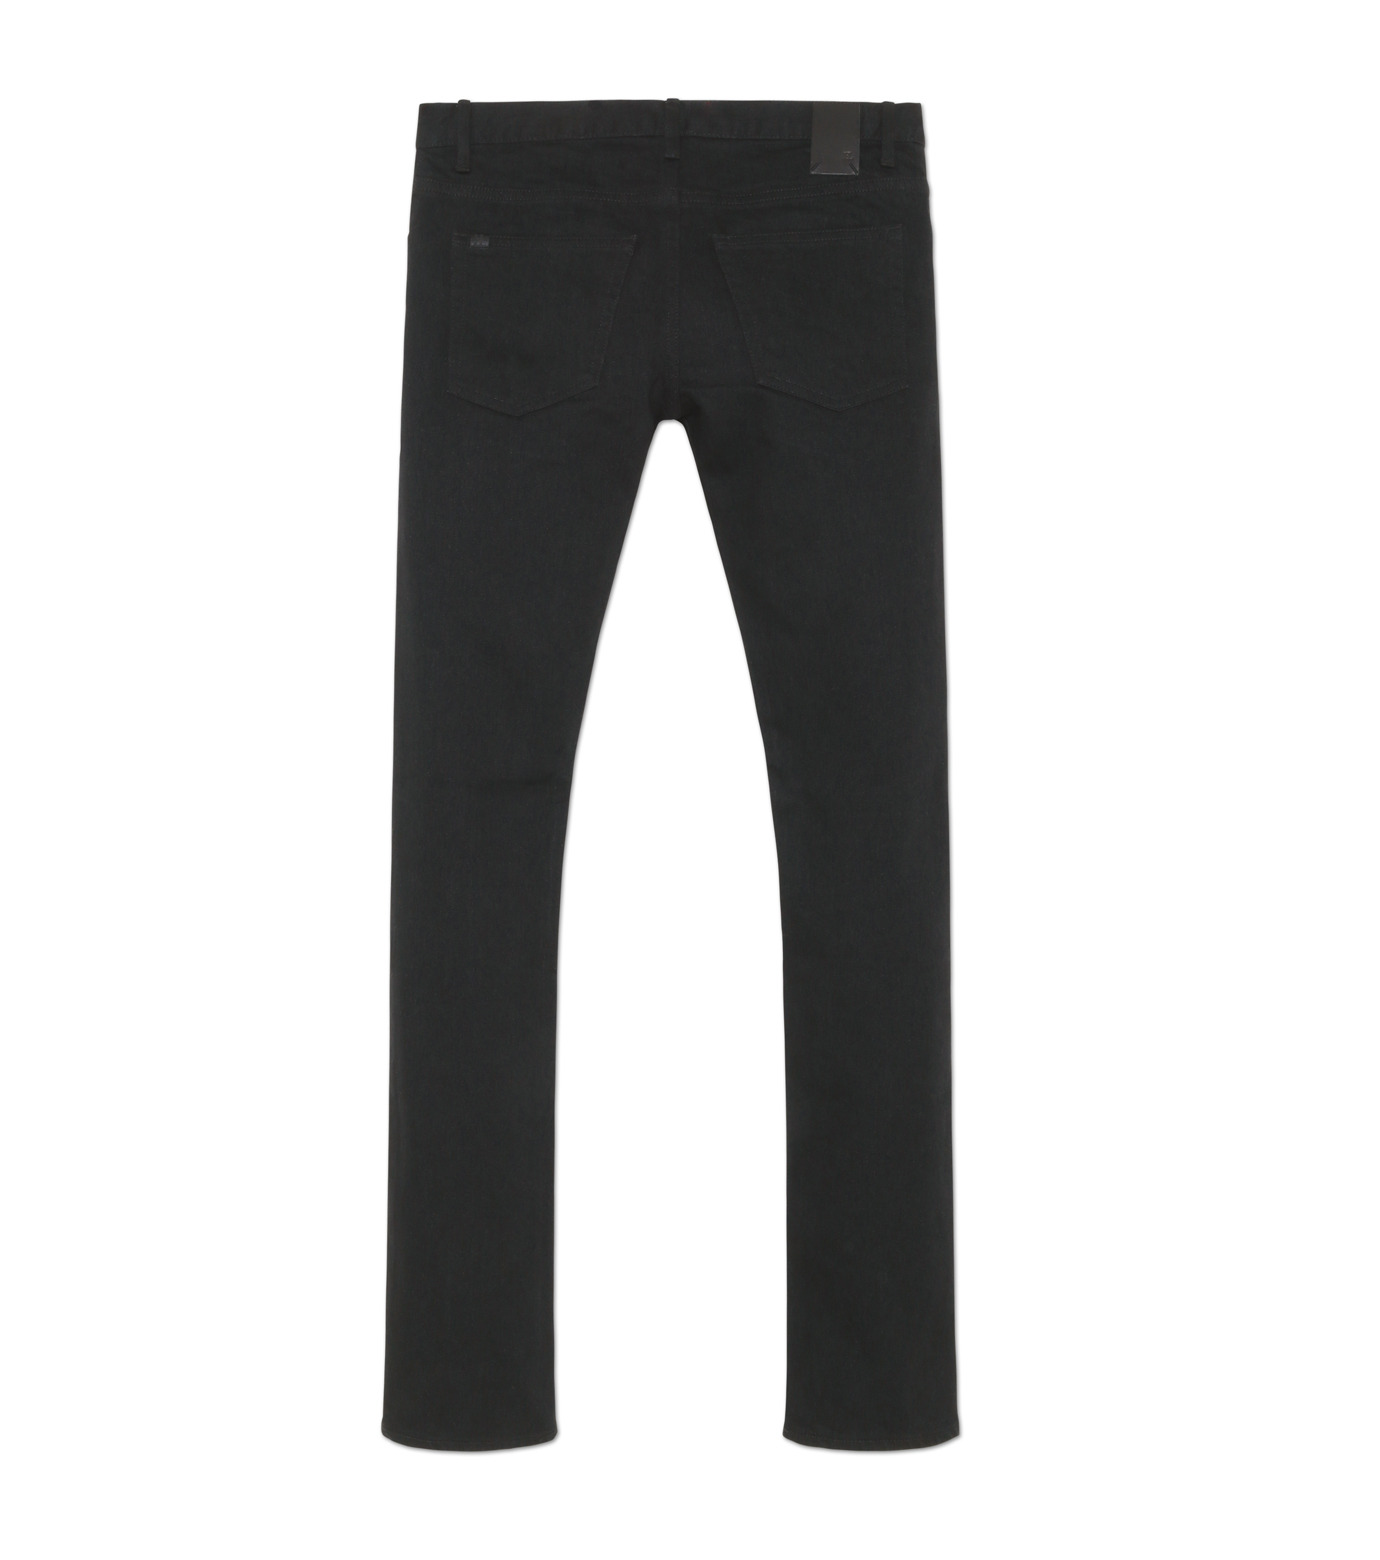 HL HEDDIE LOVU(エイチエル・エディールーヴ)のHL SUPER SLIM-BLACK(パンツ/pants)-18S98010-13 拡大詳細画像5